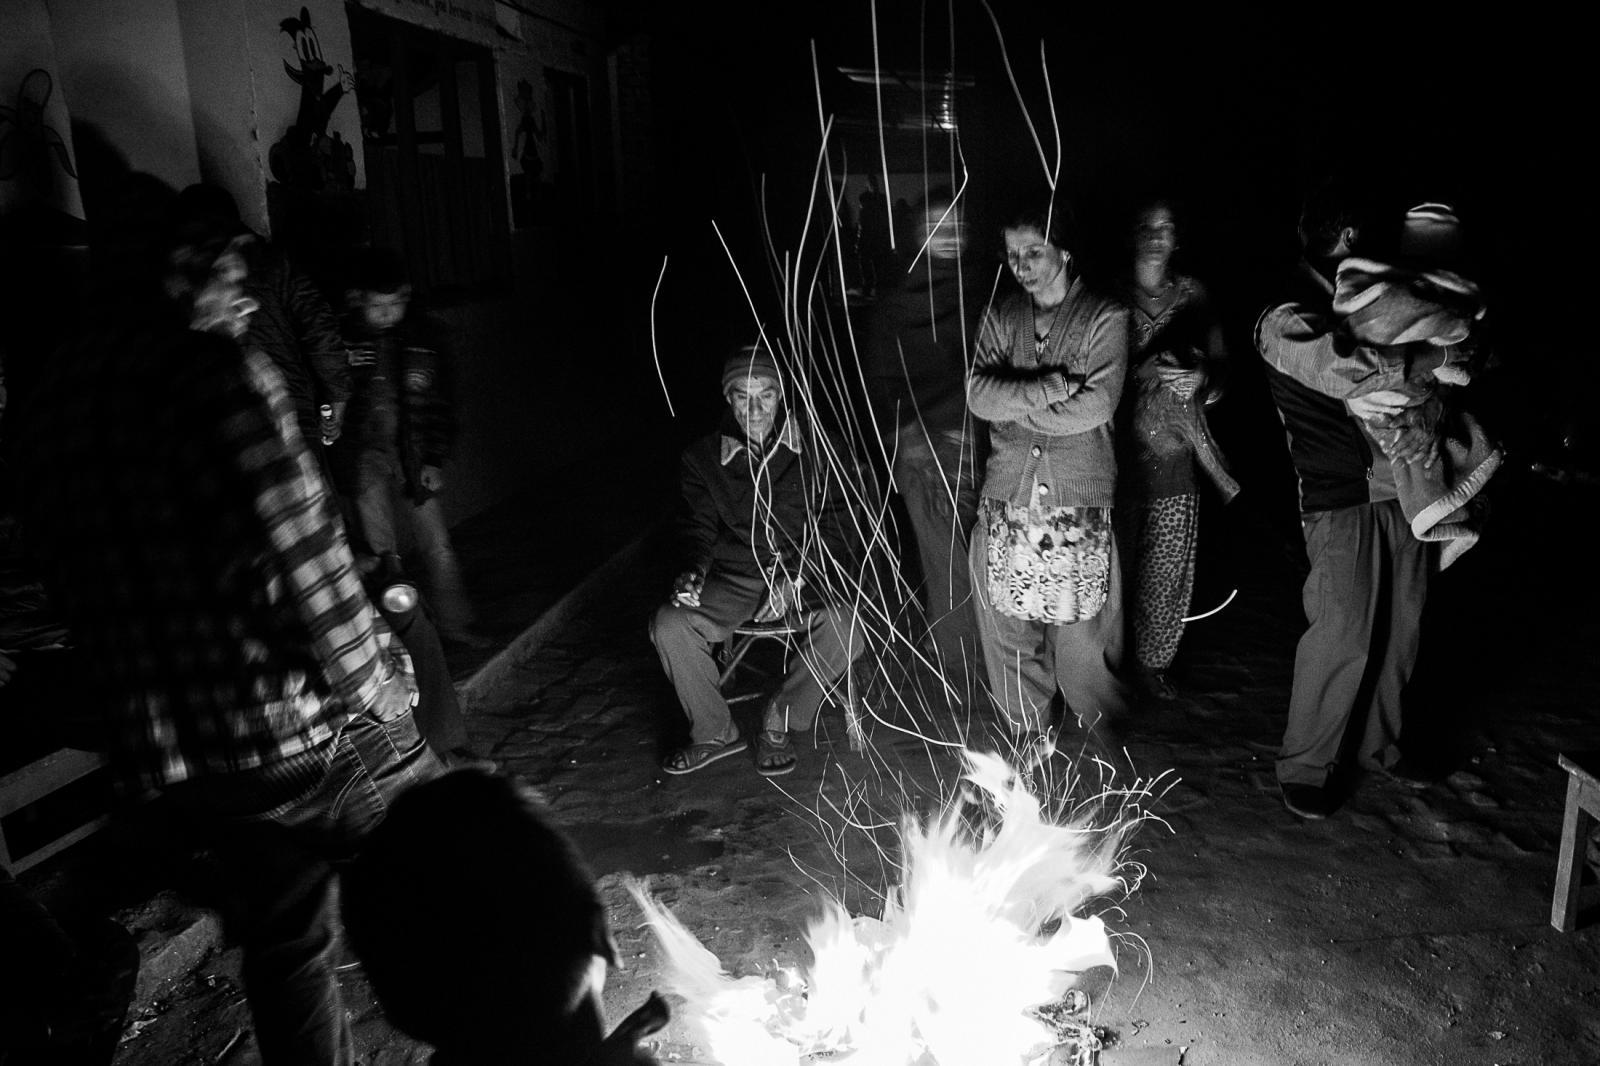 Photography image - Loading 004_Earthquake-endurance-Nepal-Omar-Havana.jpg